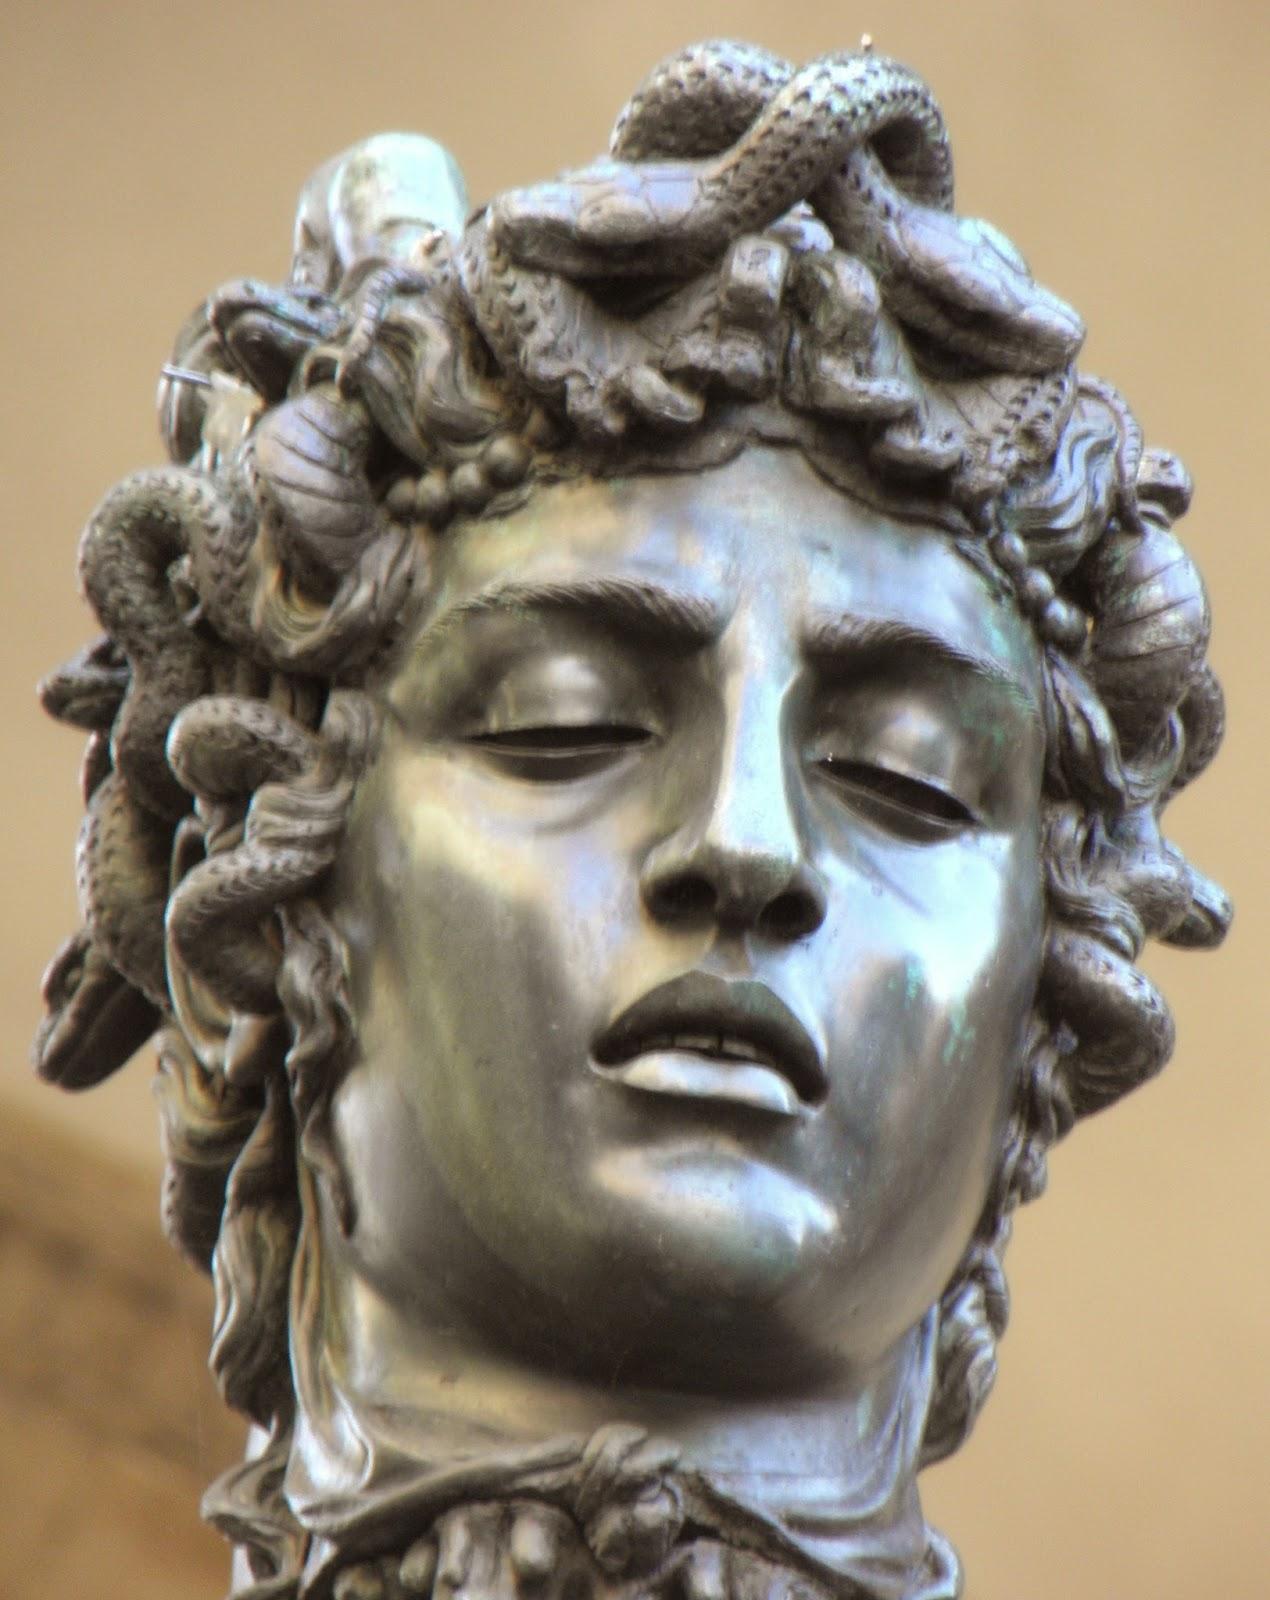 Chimeras: The head of Cellini's Medusa